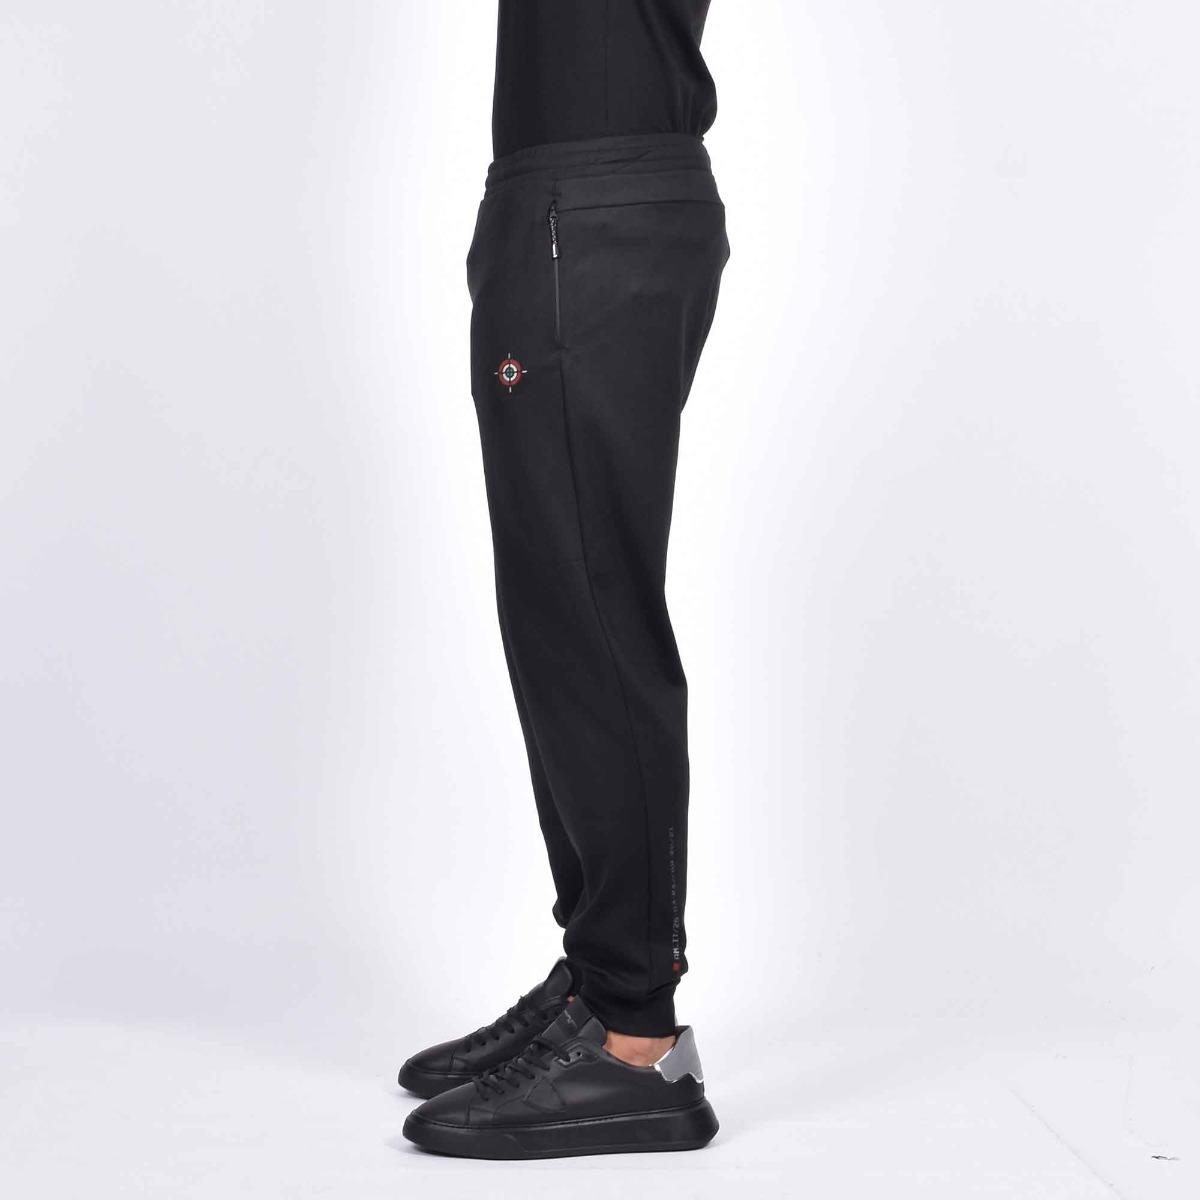 Pantalone active - Nero